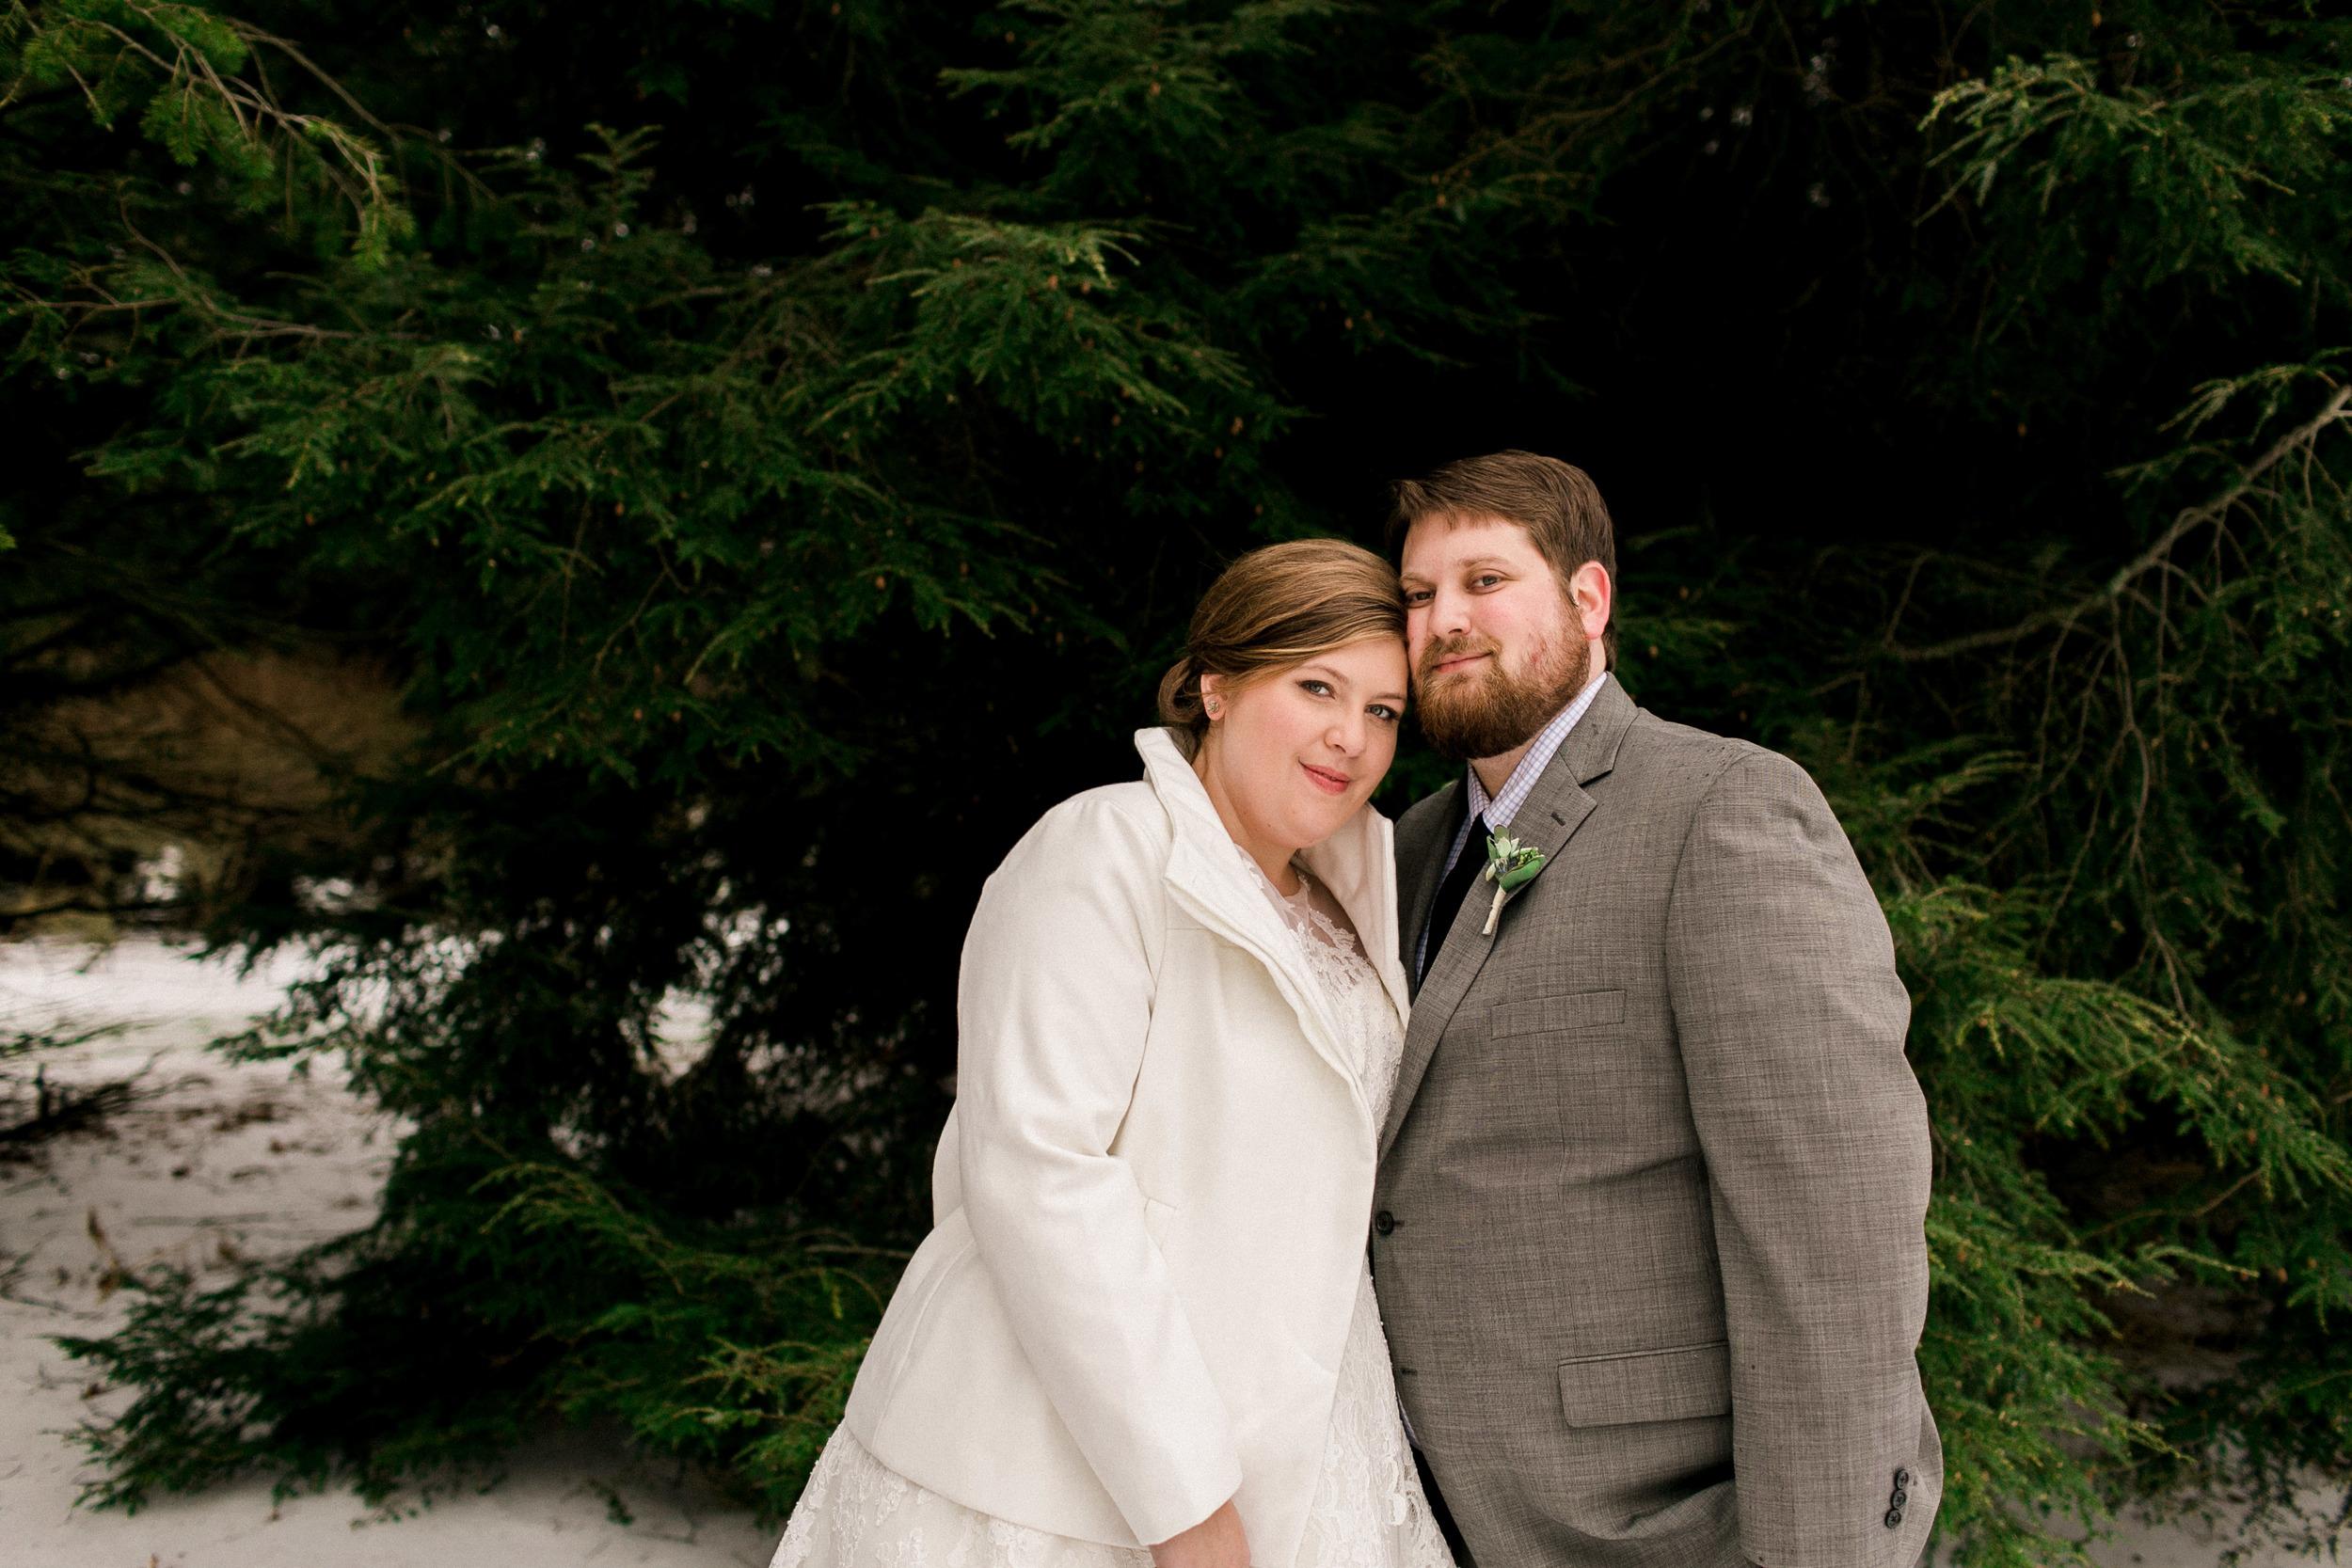 mayden photography_bridal portraits-42.jpg